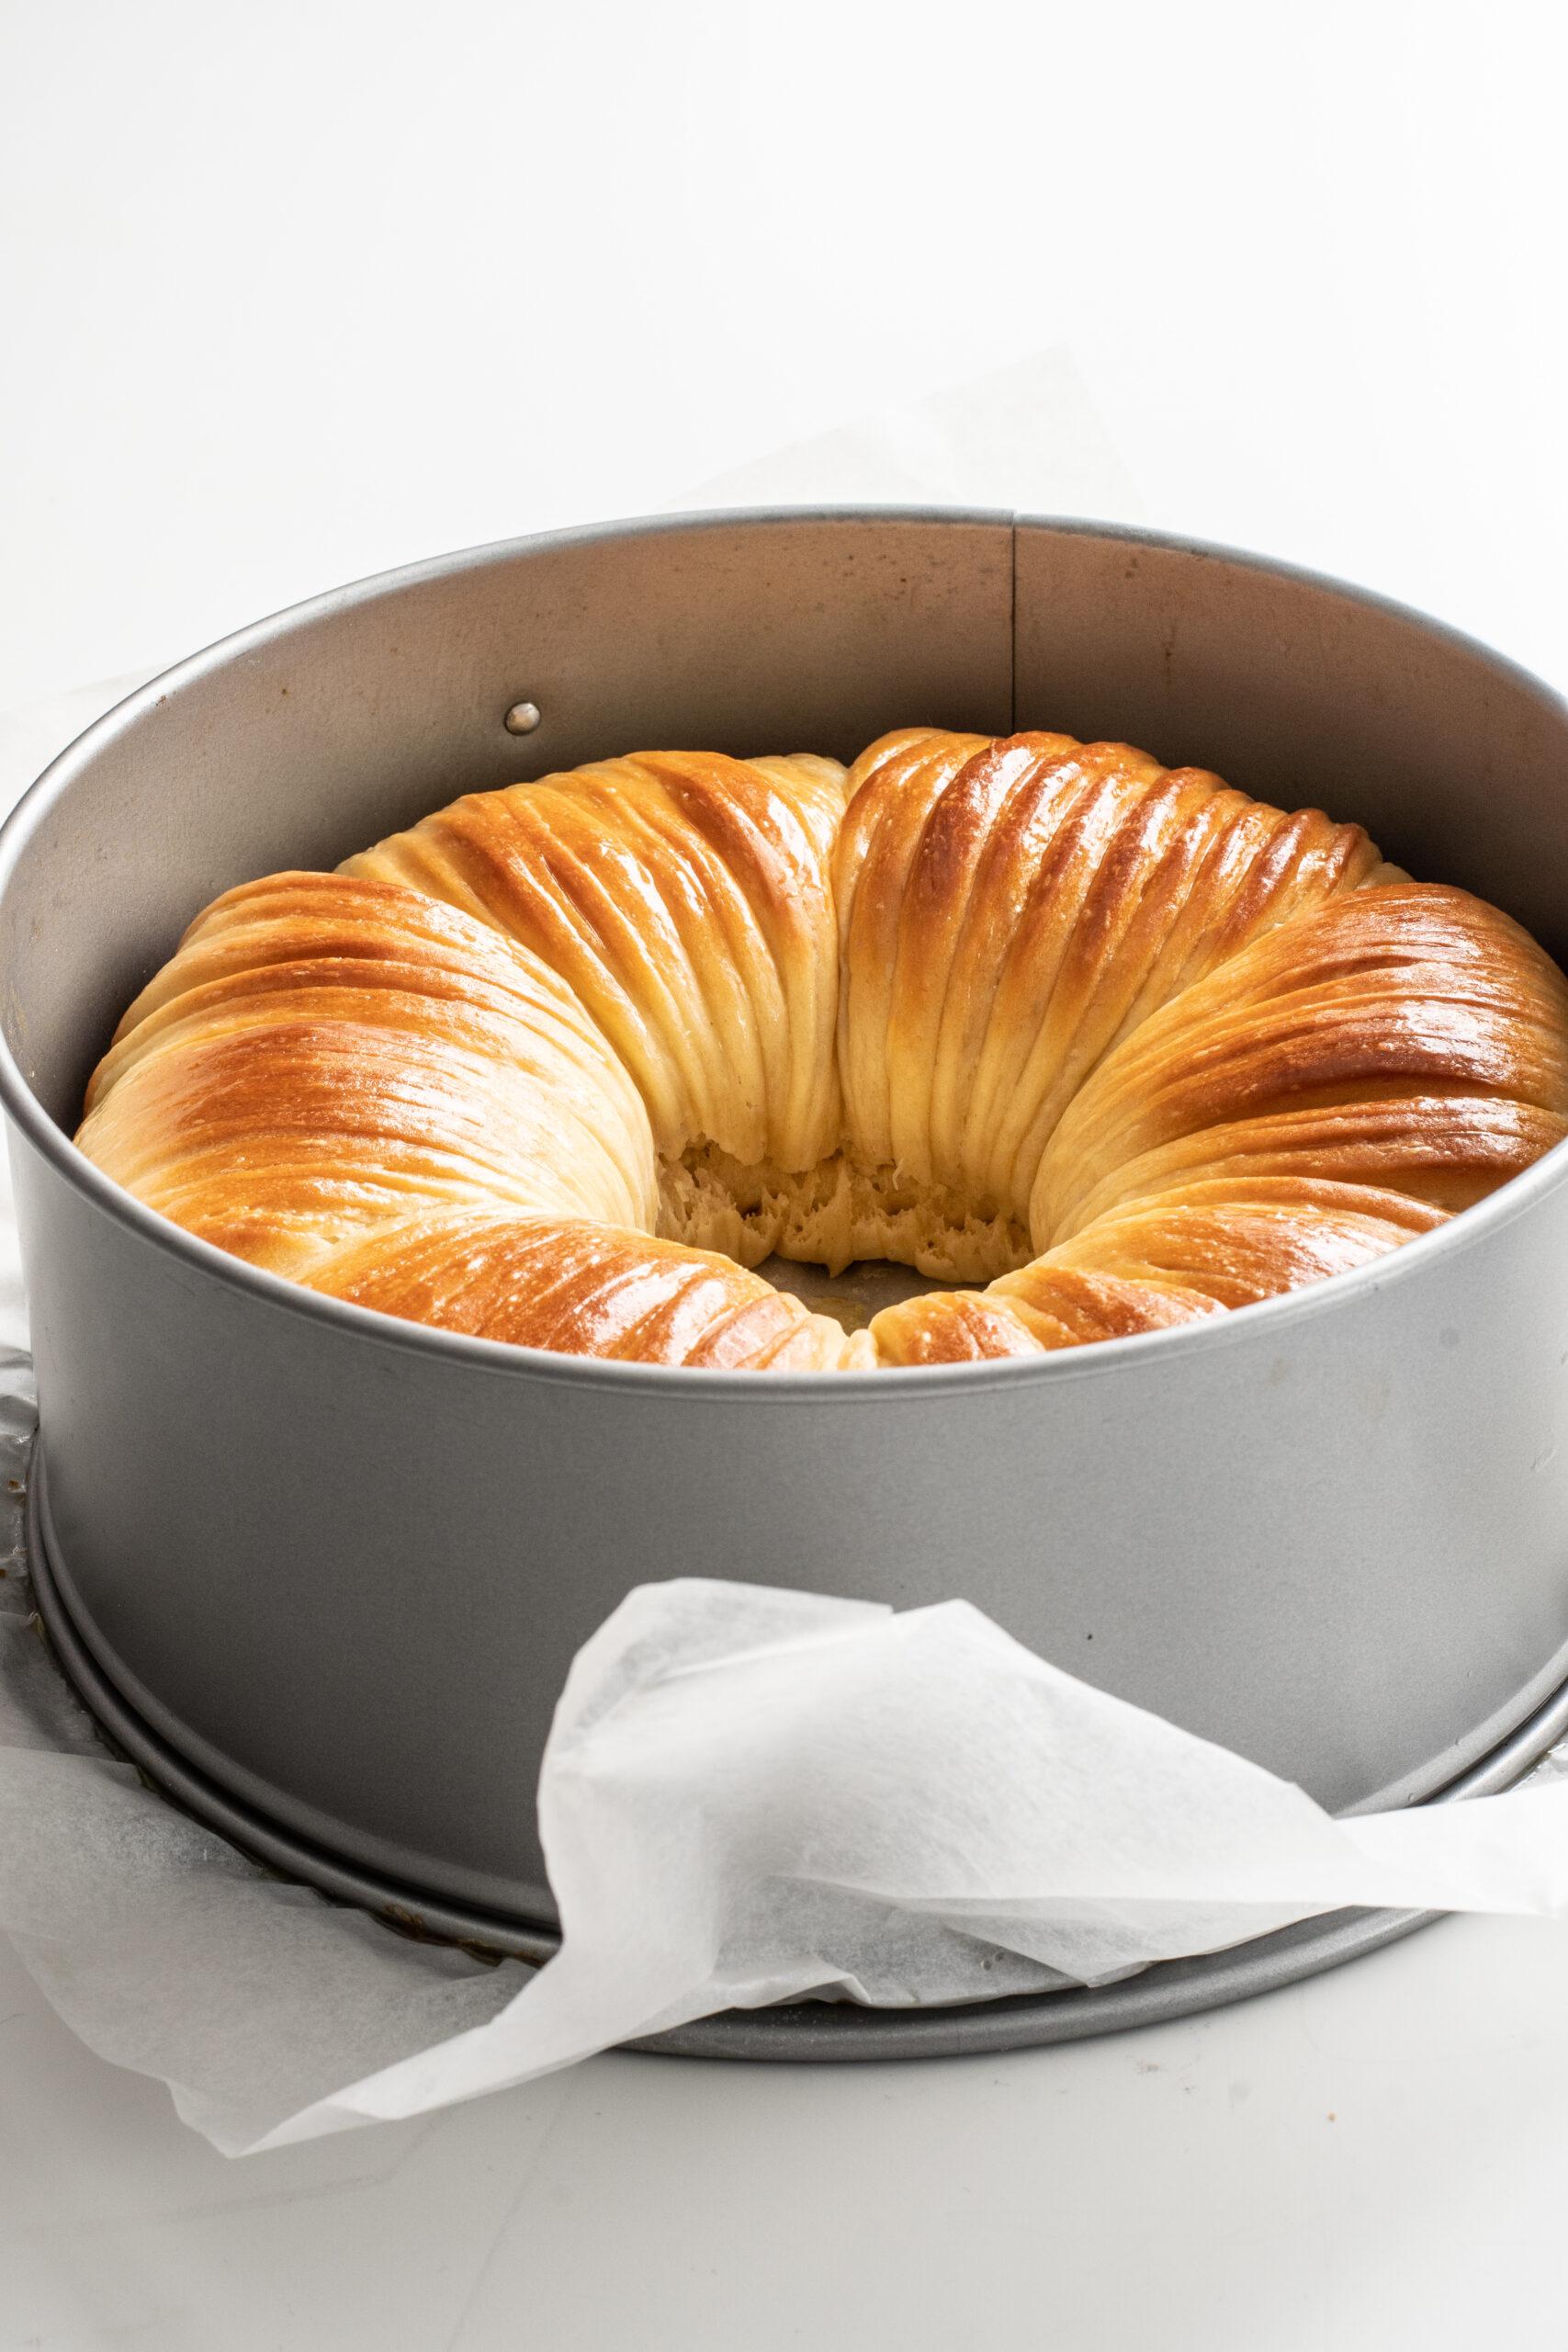 Wool roll bread mandelmassa bakalite.se 2